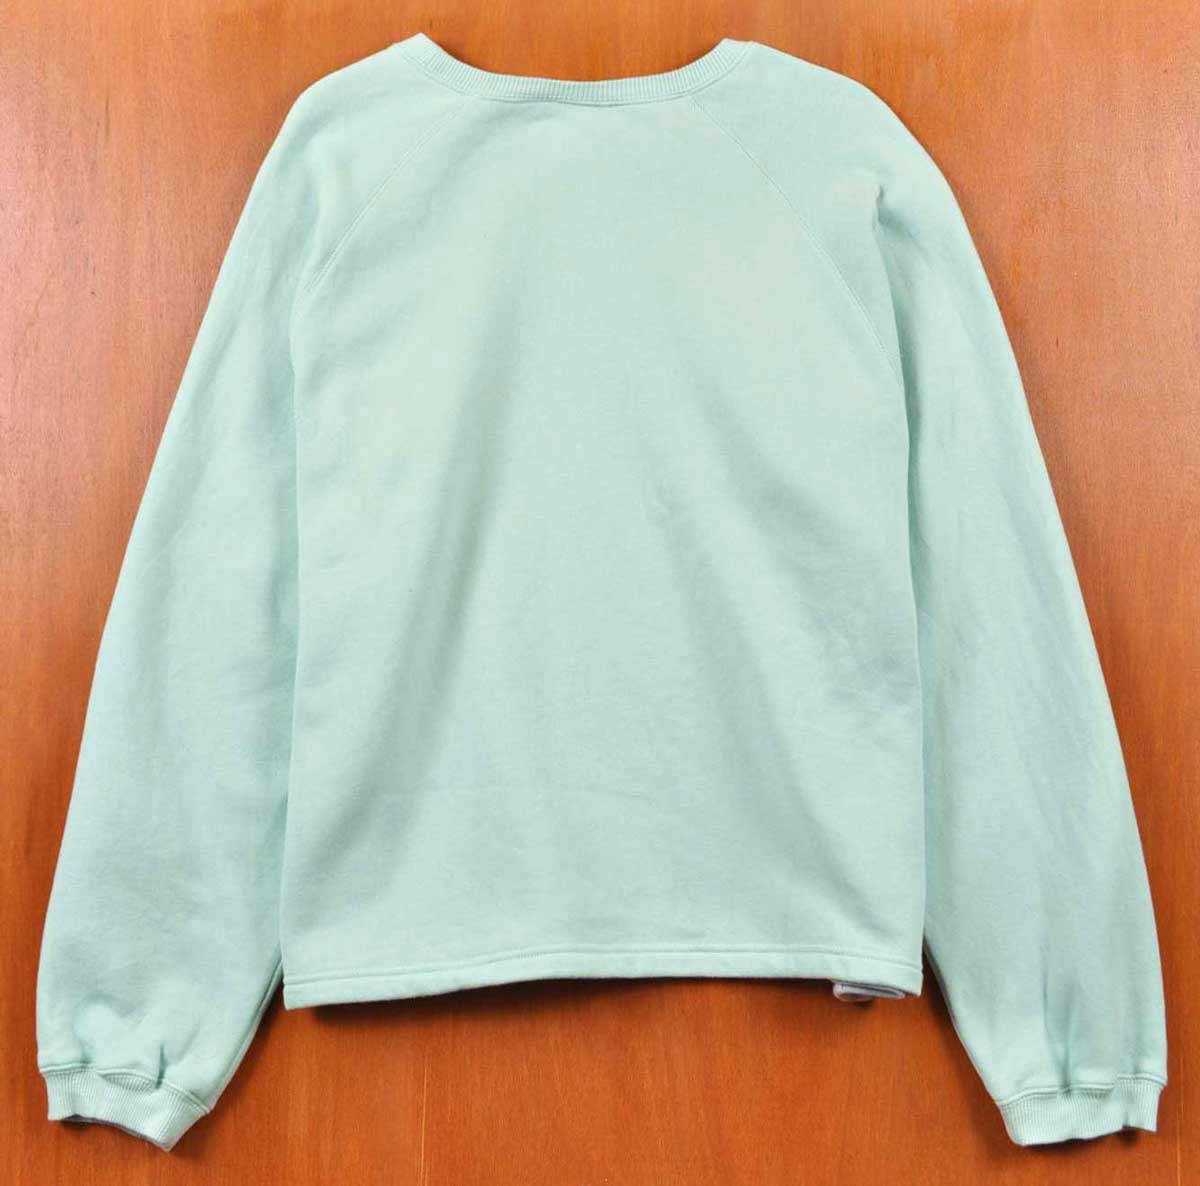 shirt blue adidas side mint L line men Adidas sweat X pastel